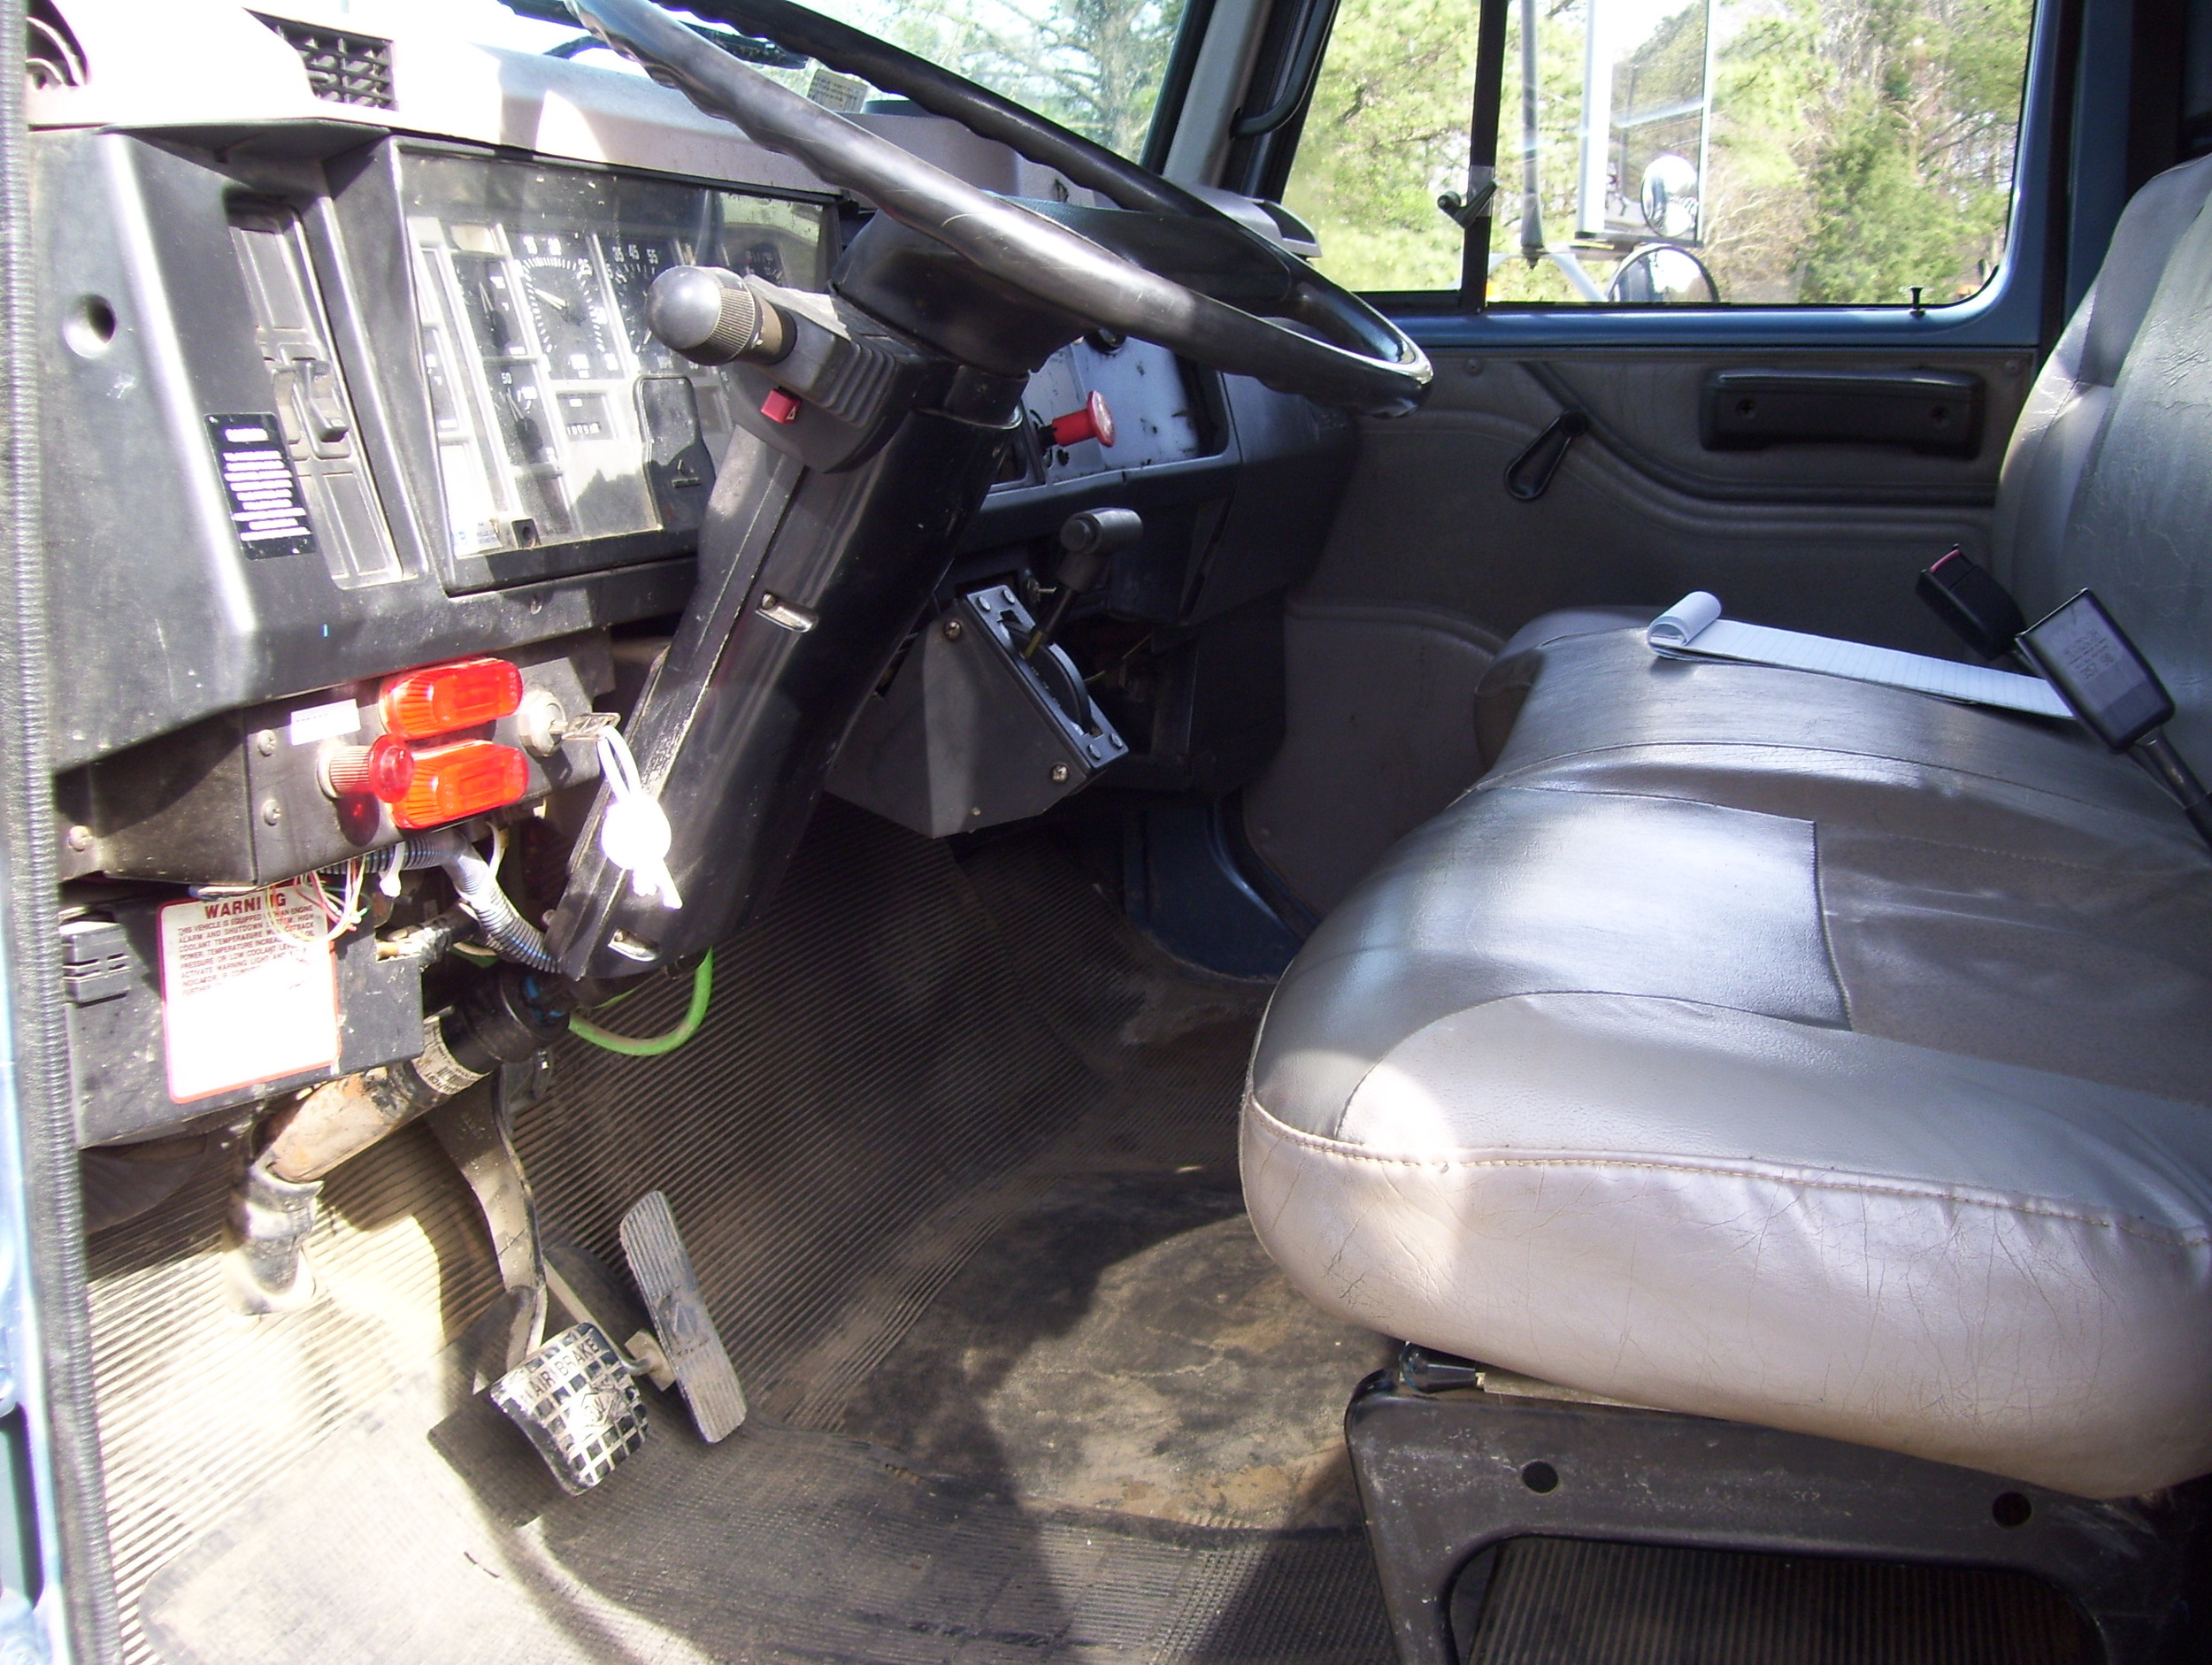 99 International Service Truck 002.jpg